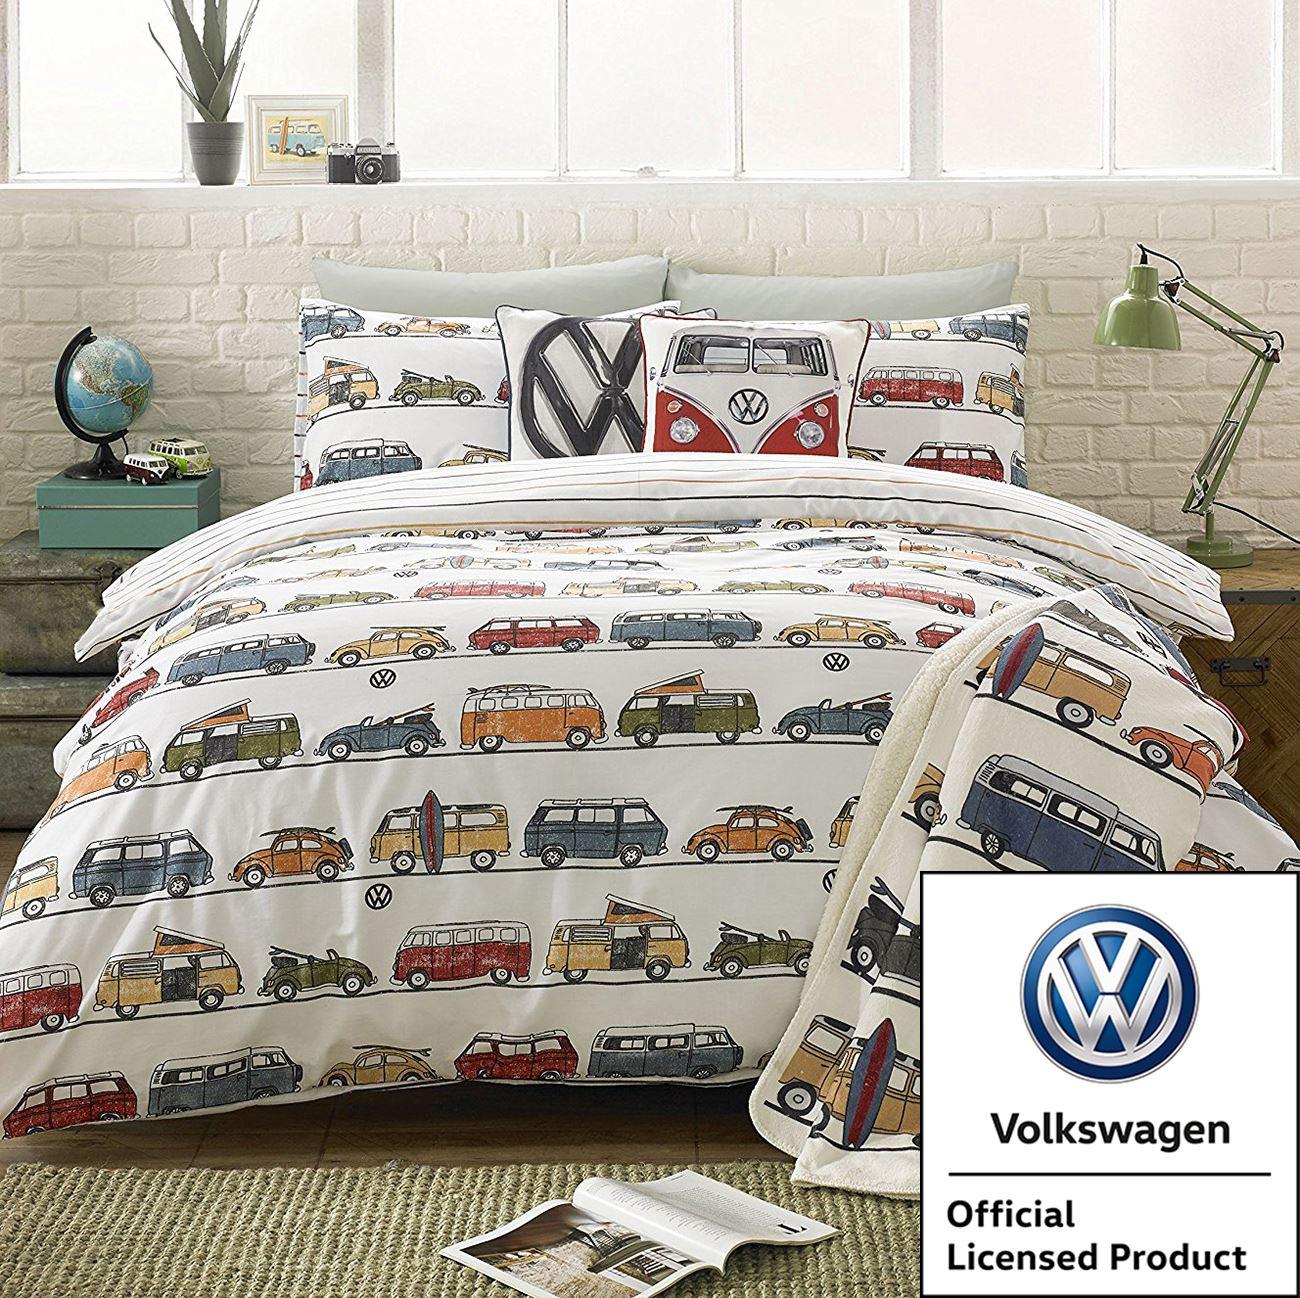 Details about VW VOLKSWAGEN CAMPERVAN BEDROOM - DUVET COVER SET SINGLE  DOUBLE   THROW BLANKET 2d3972802